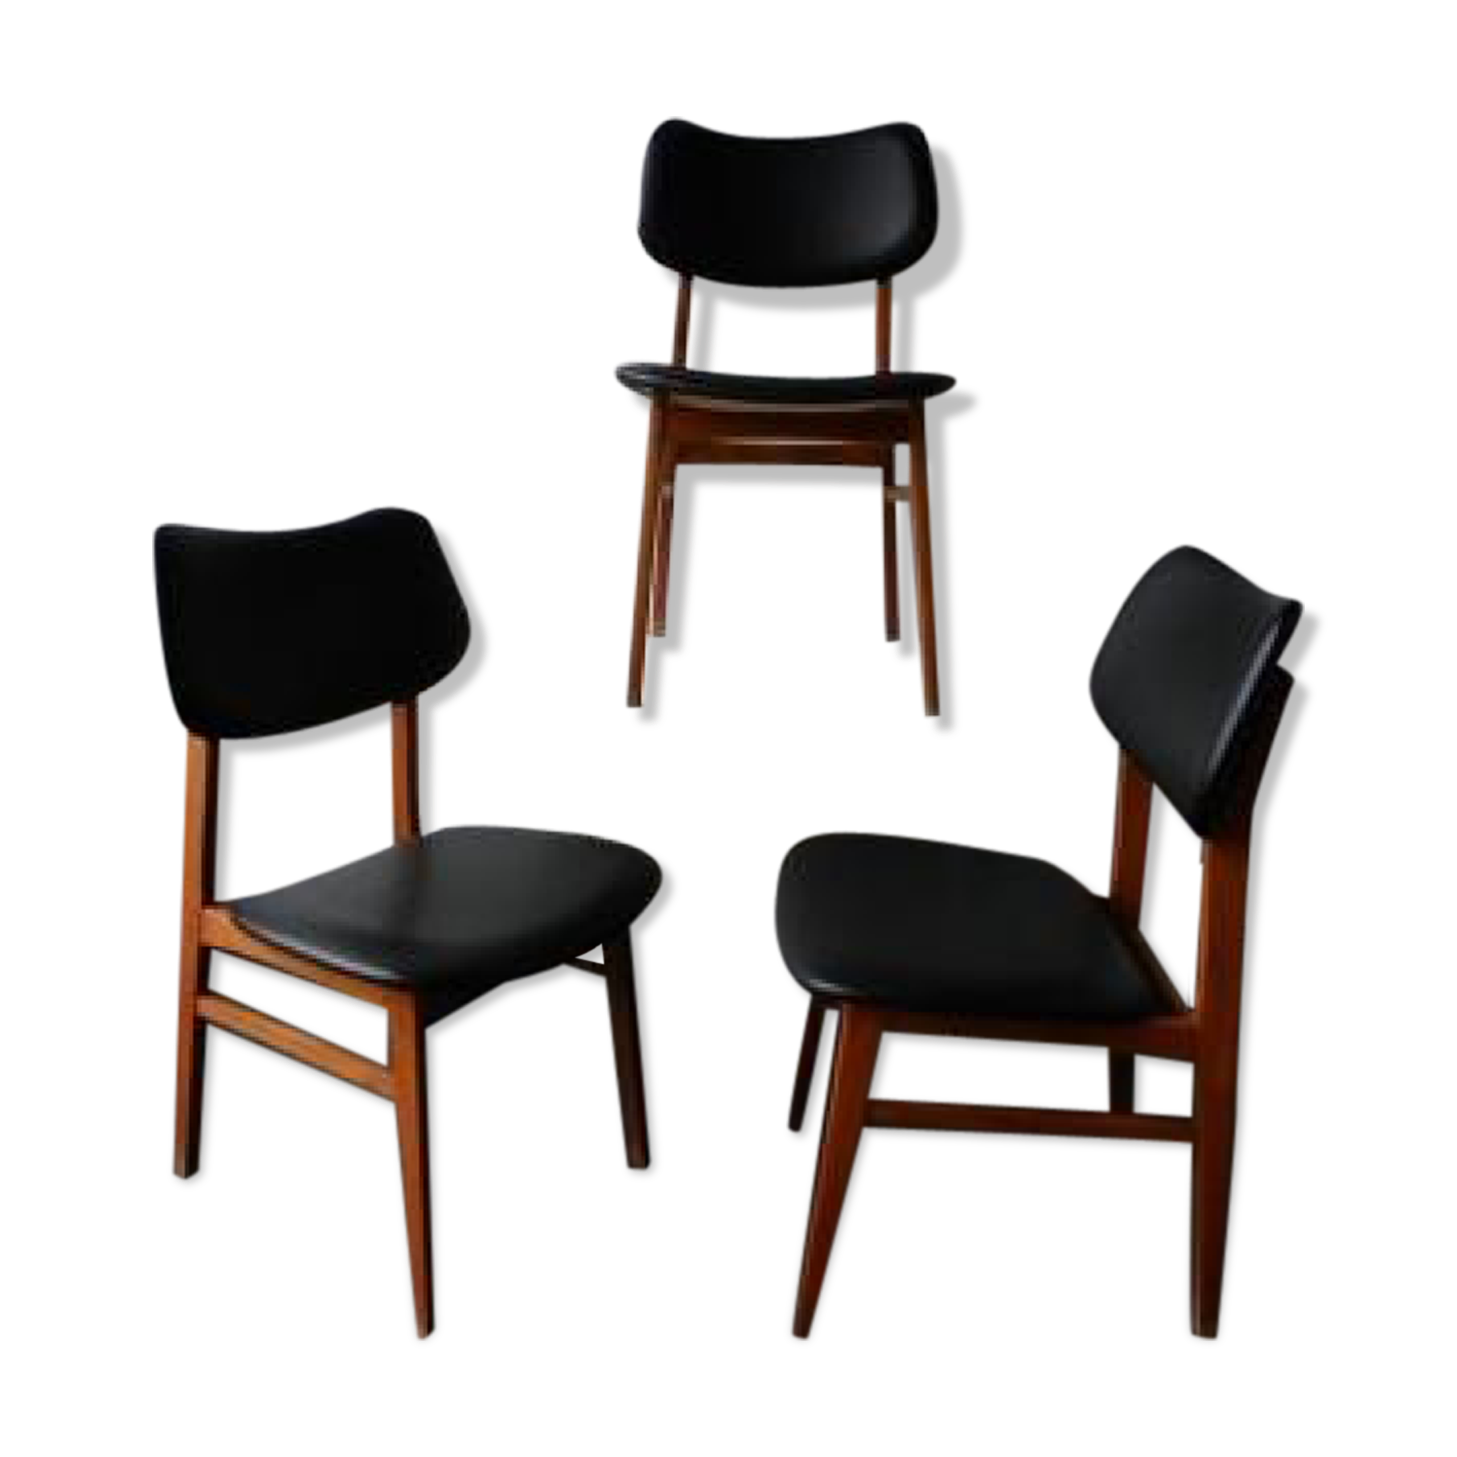 Chaise plexiglas haute savoie gallery of chaise en plexiglas chaise plexiglas cr living room - Chaise en plexiglas transparent ...